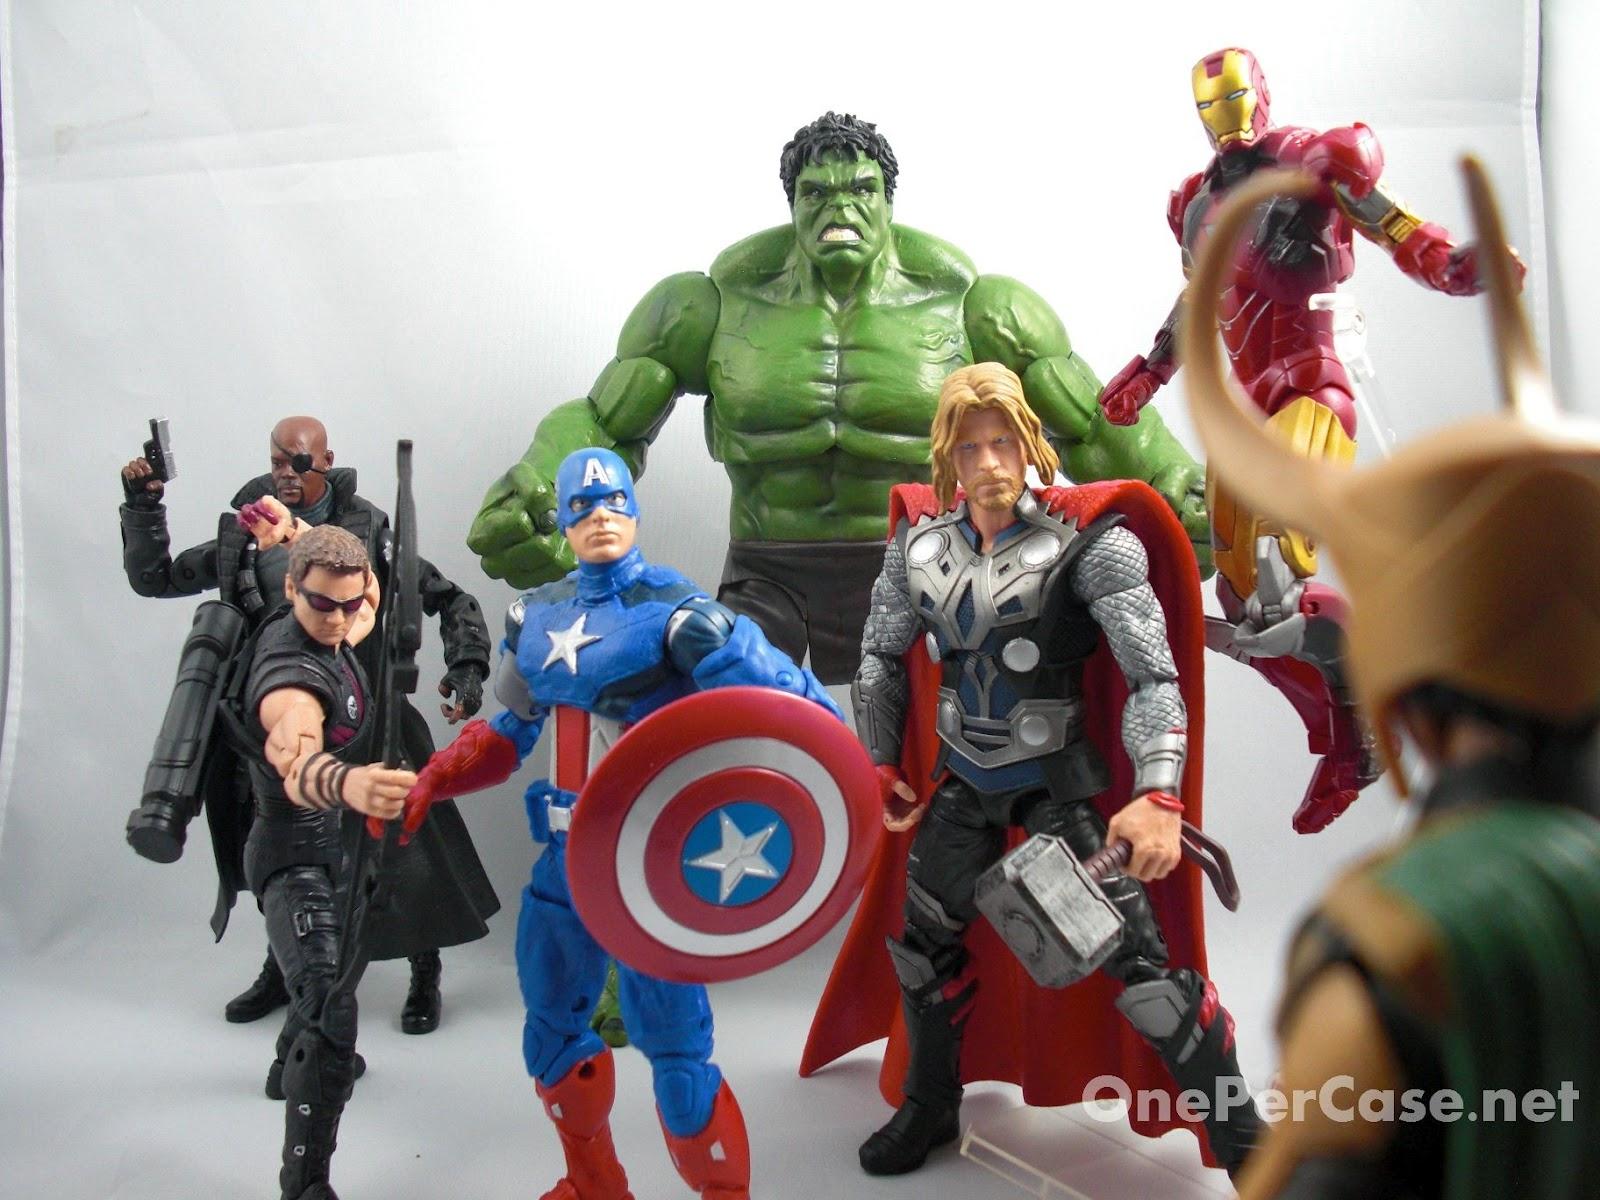 One Per Case: The Avengers Marvel Select Hulk